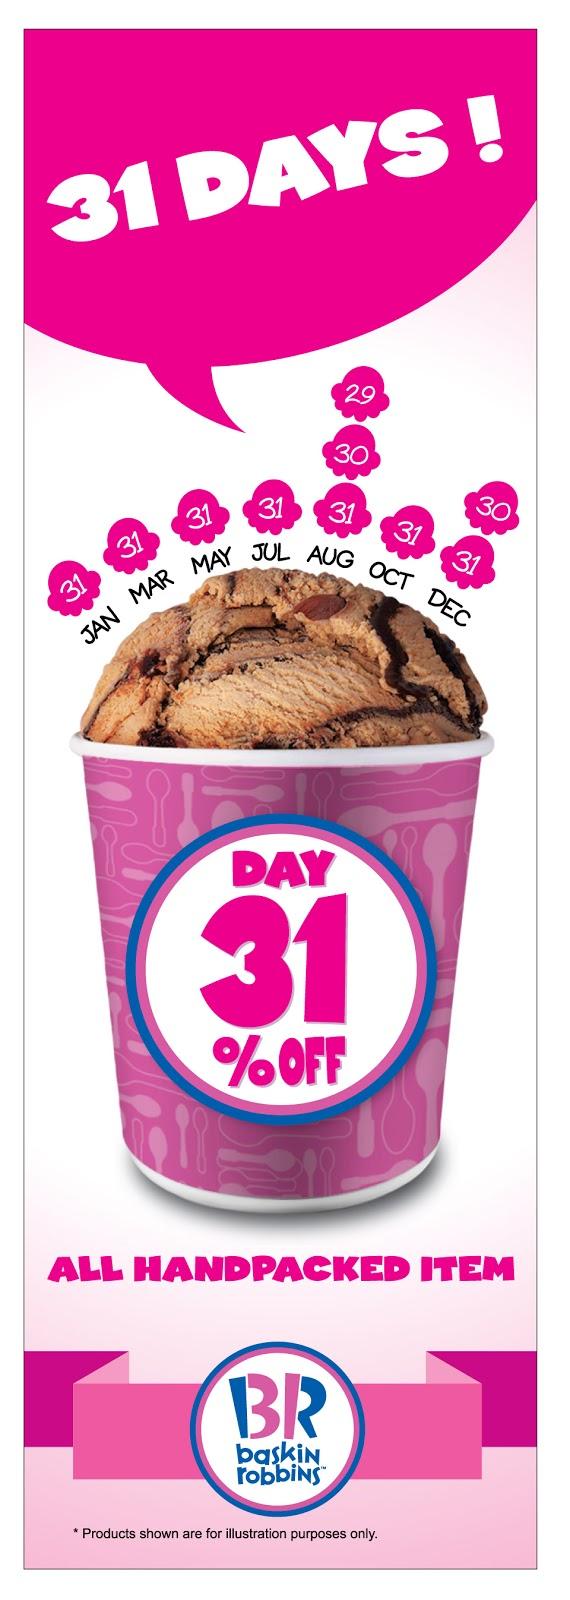 Baskin-Robbins Malaysia Discount Promotion